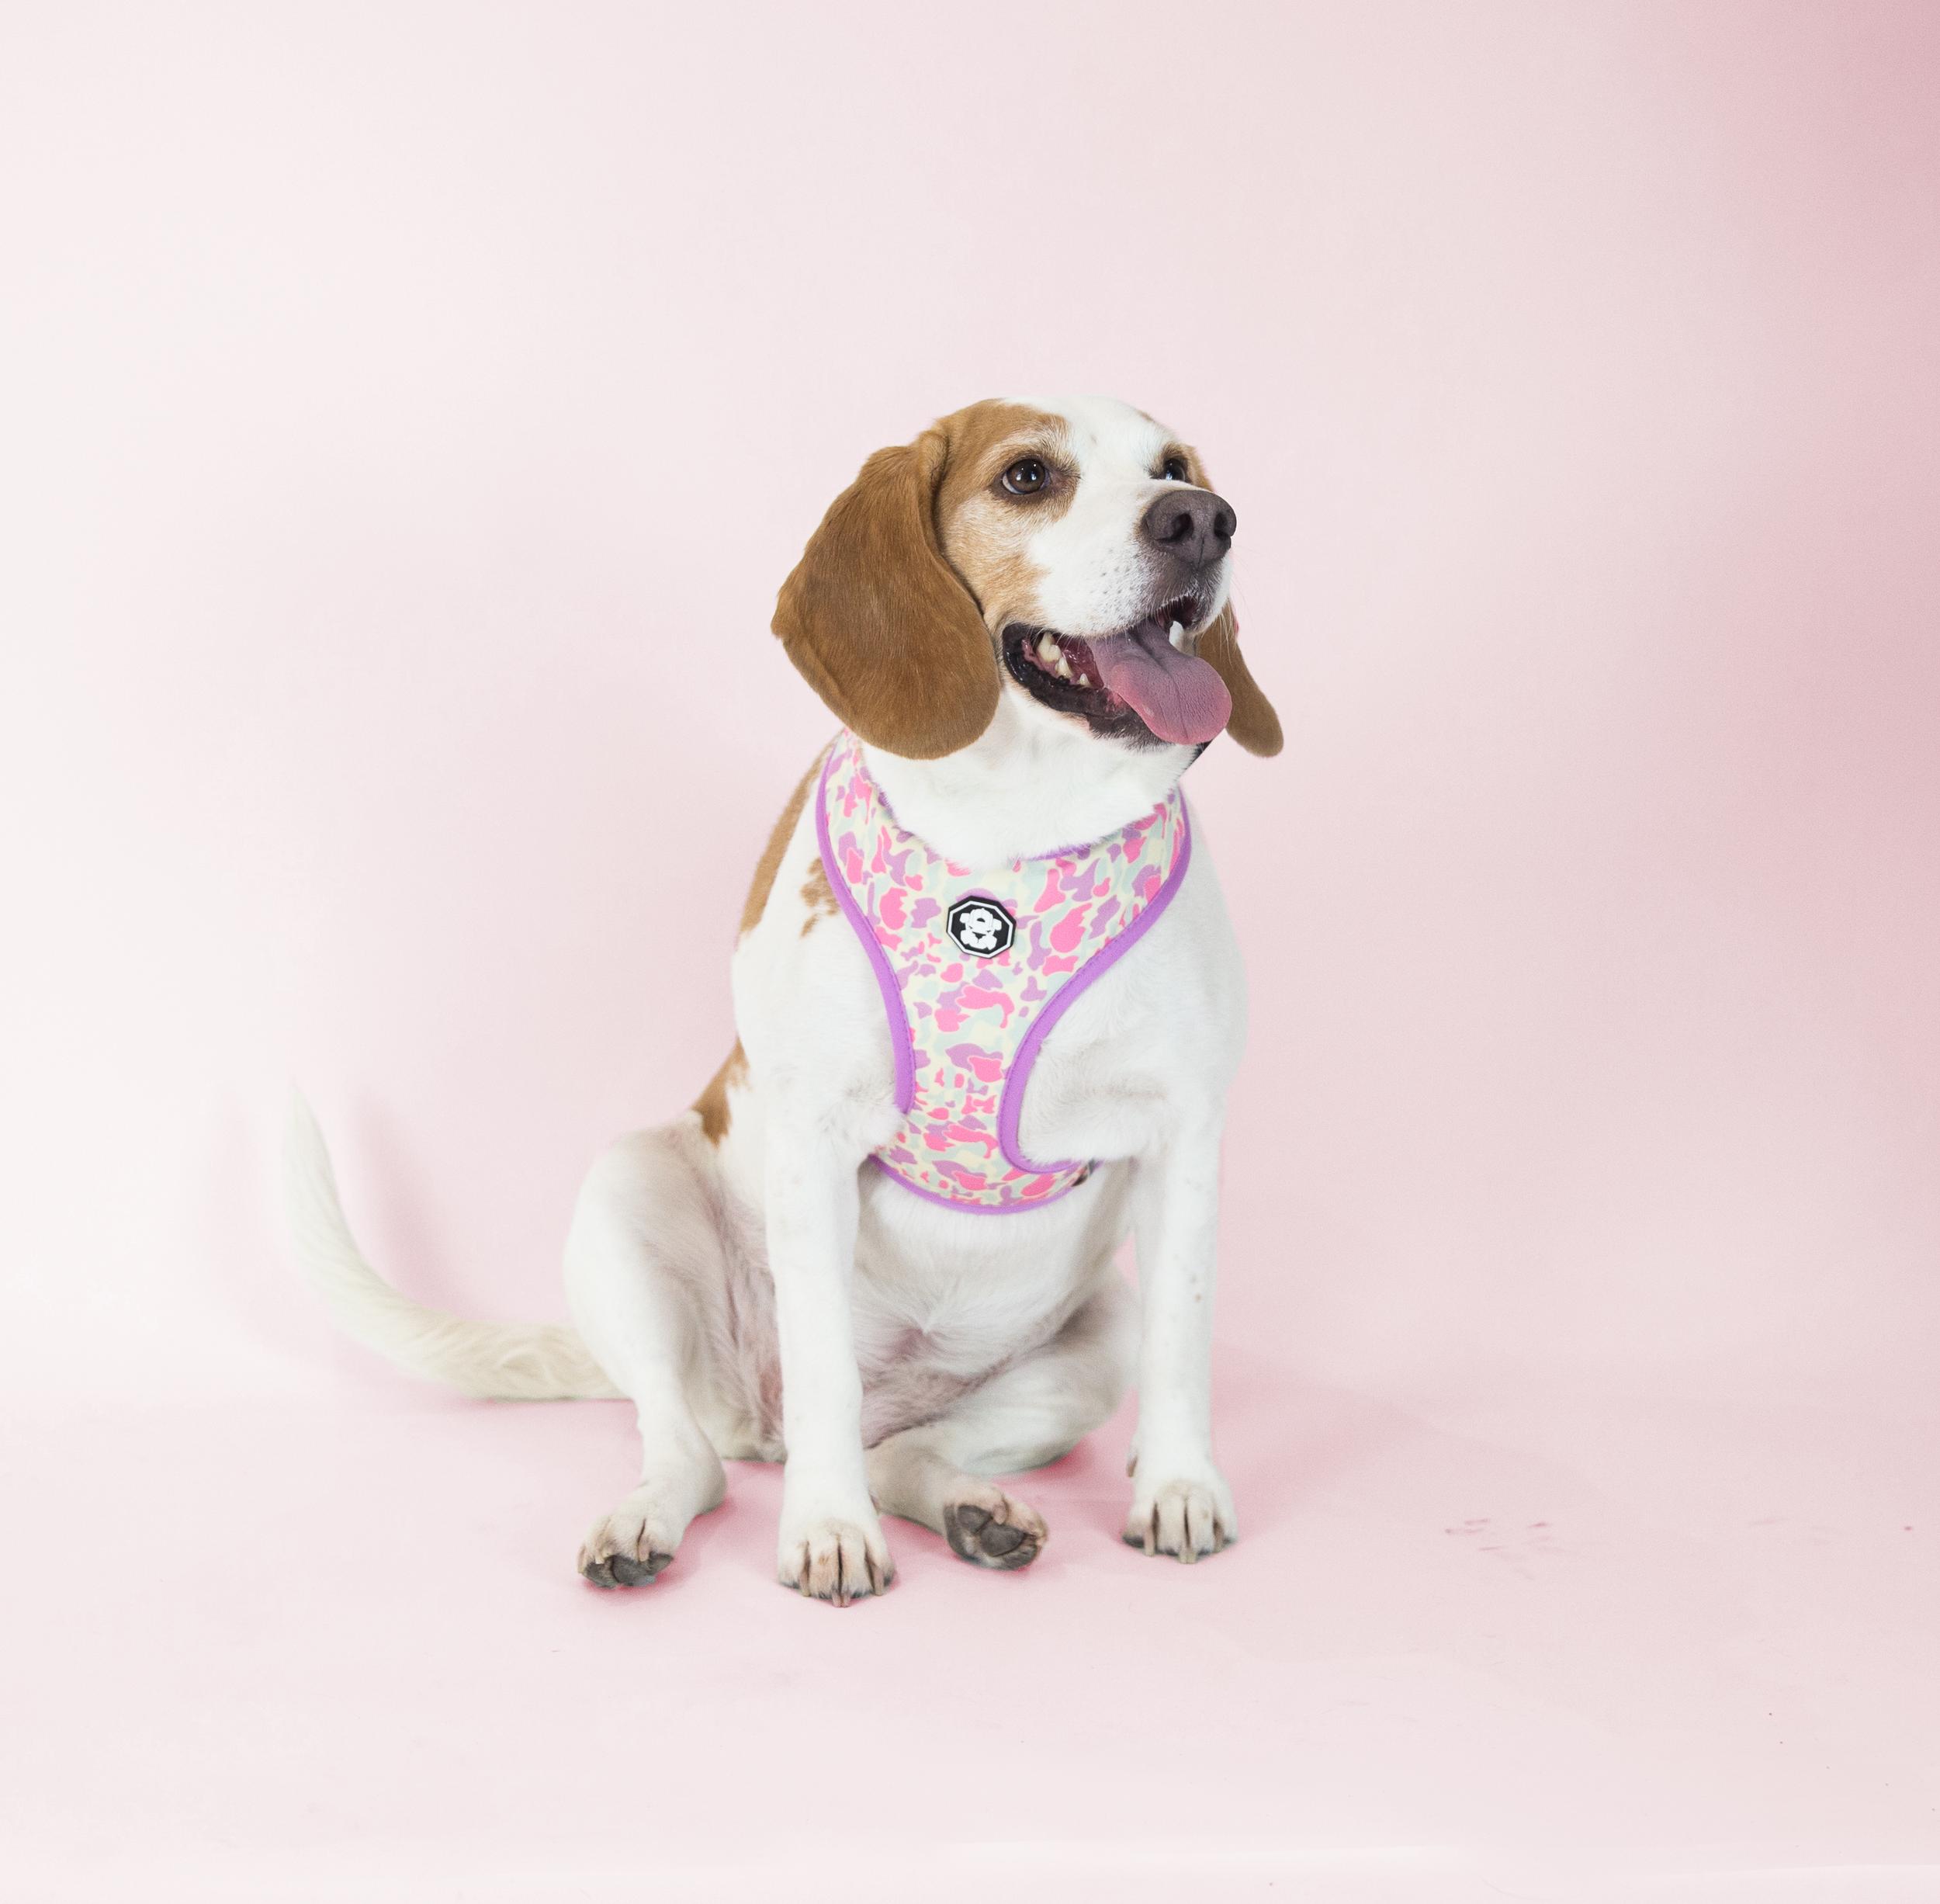 Meet Lily. - Age: 5 years oldBreed: Lemon BeagleHometown: Toronto, Ontario